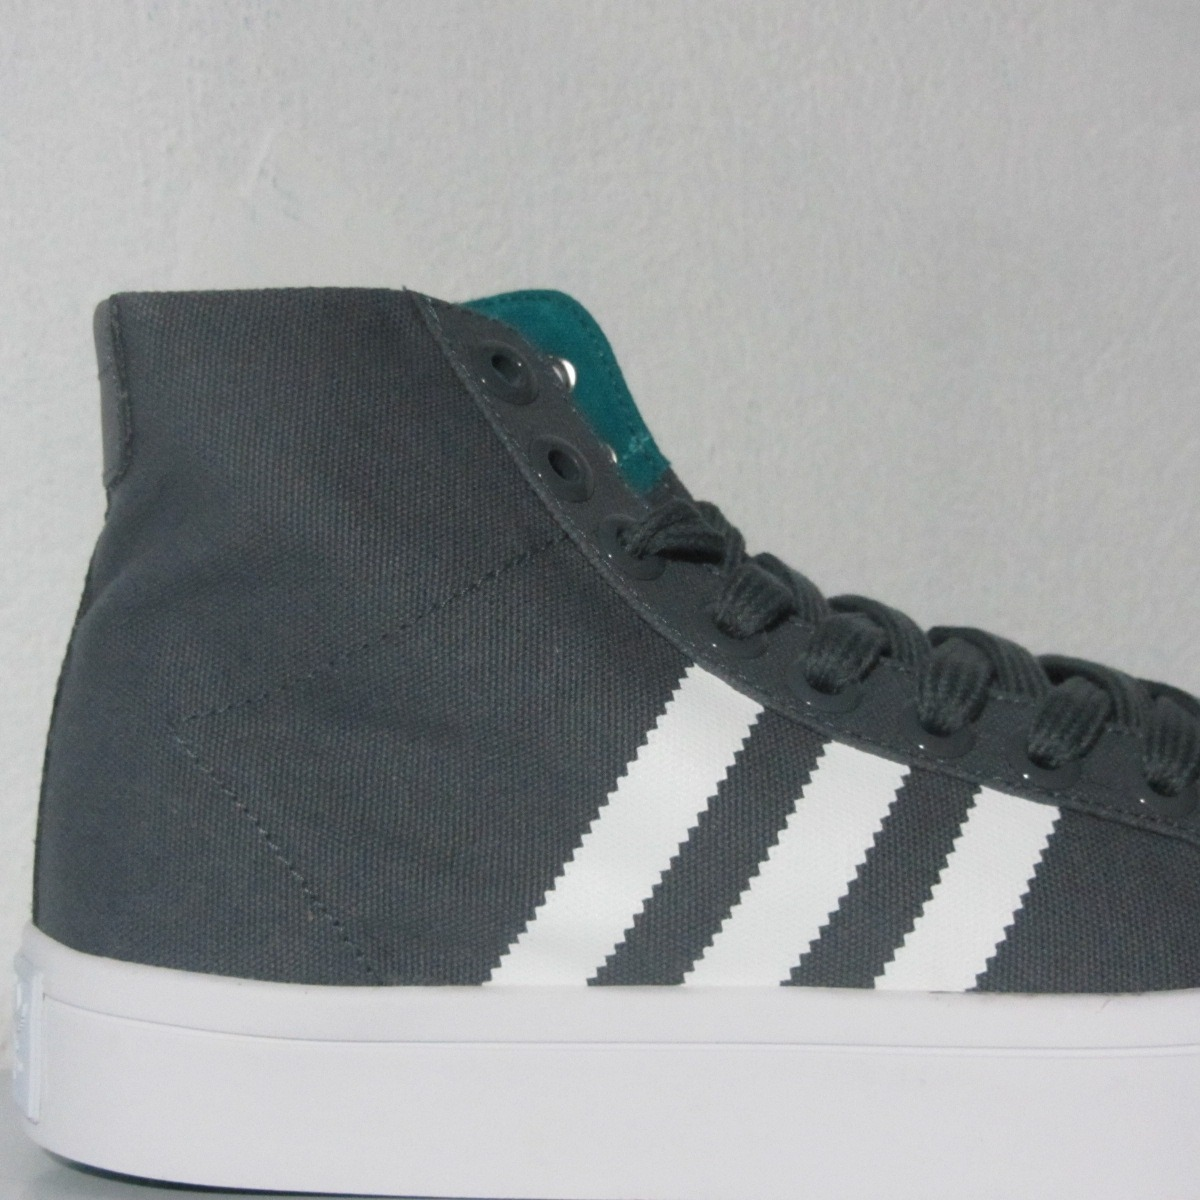 06e5dccc Zapatillas adidas Originals Court Vantage Mid W Oferta - $ 999,00 en ...